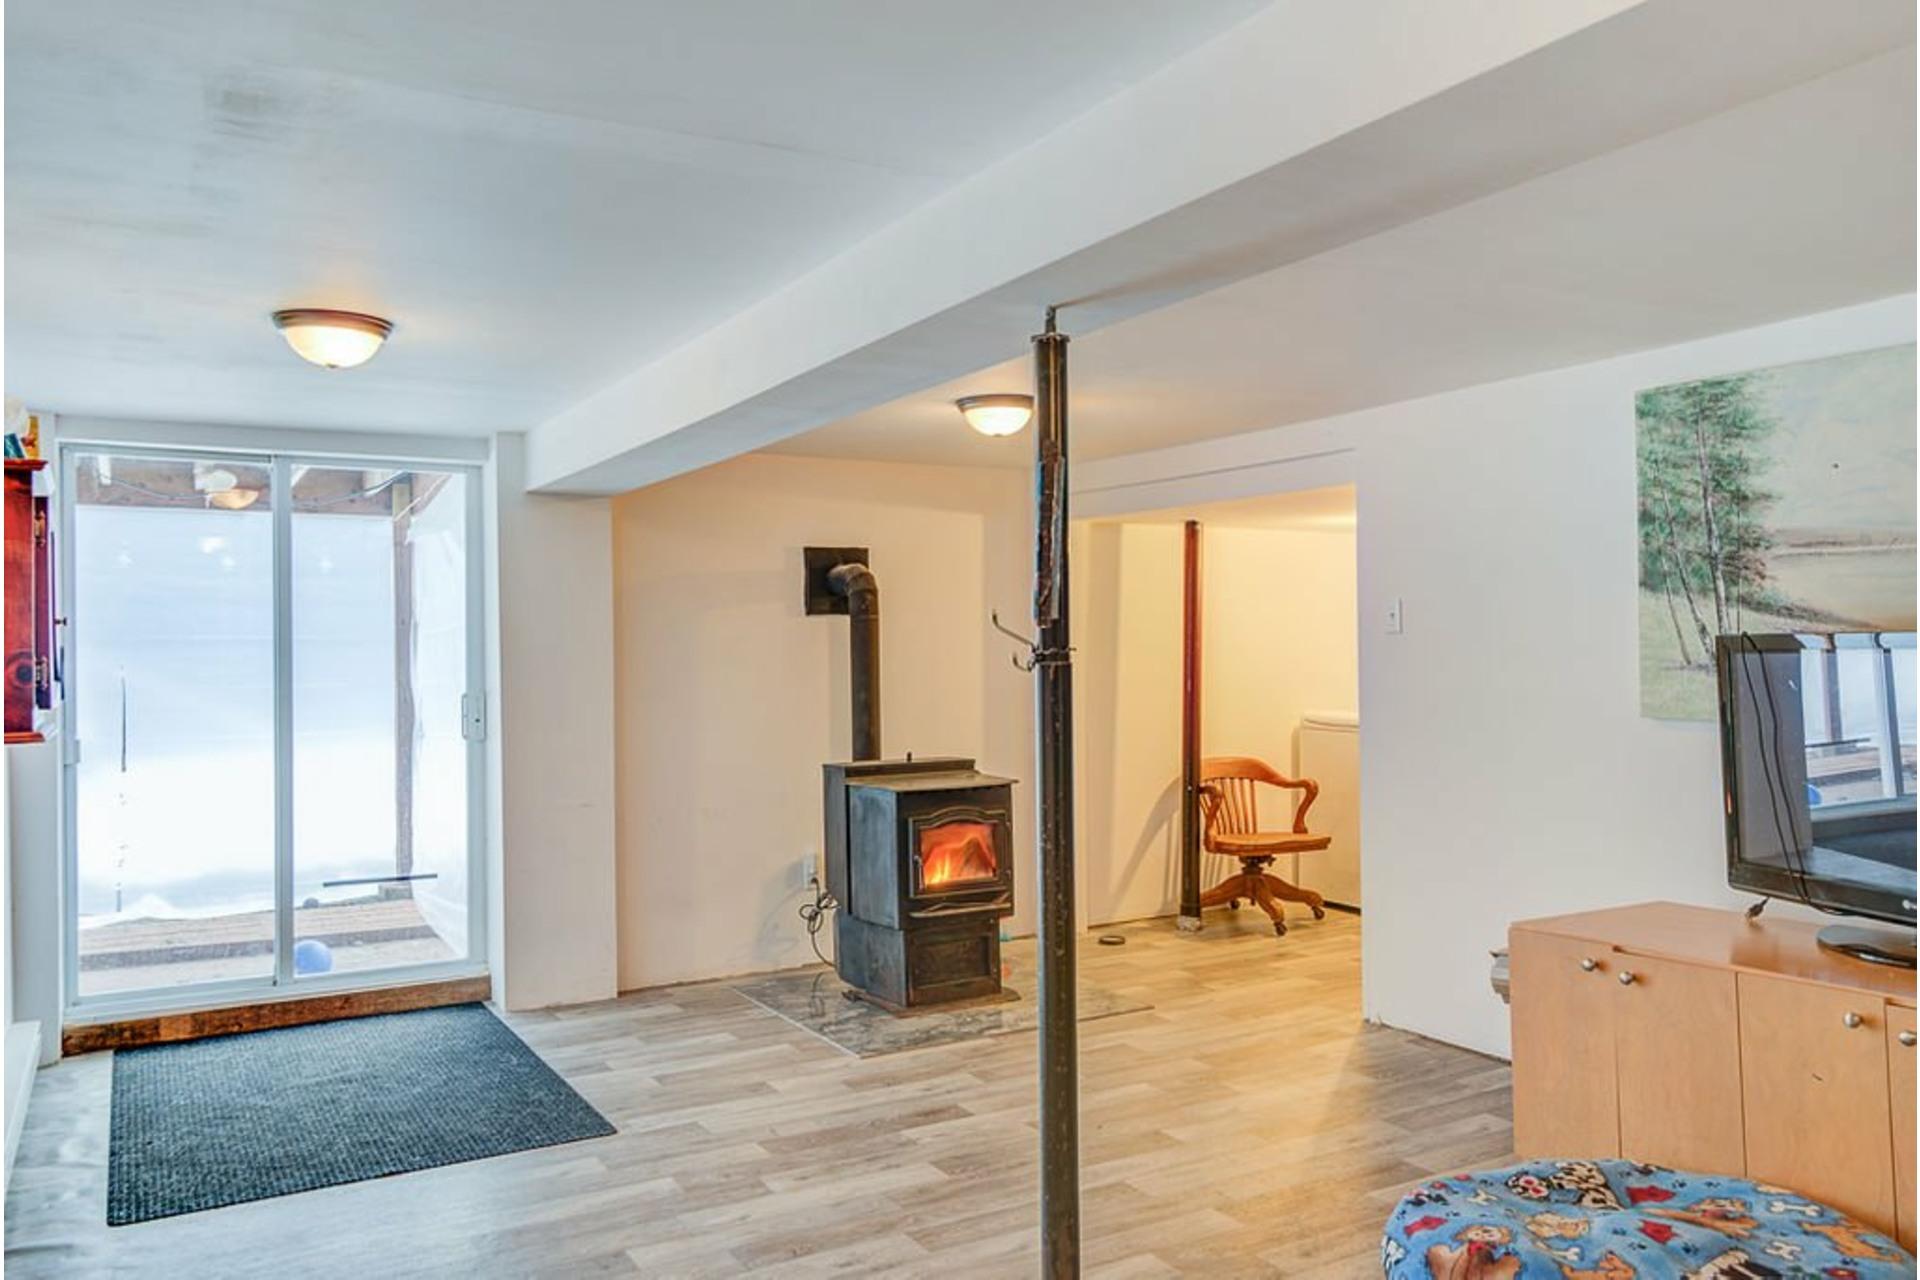 image 23 - House For sale Sainte-Julienne - 7 rooms